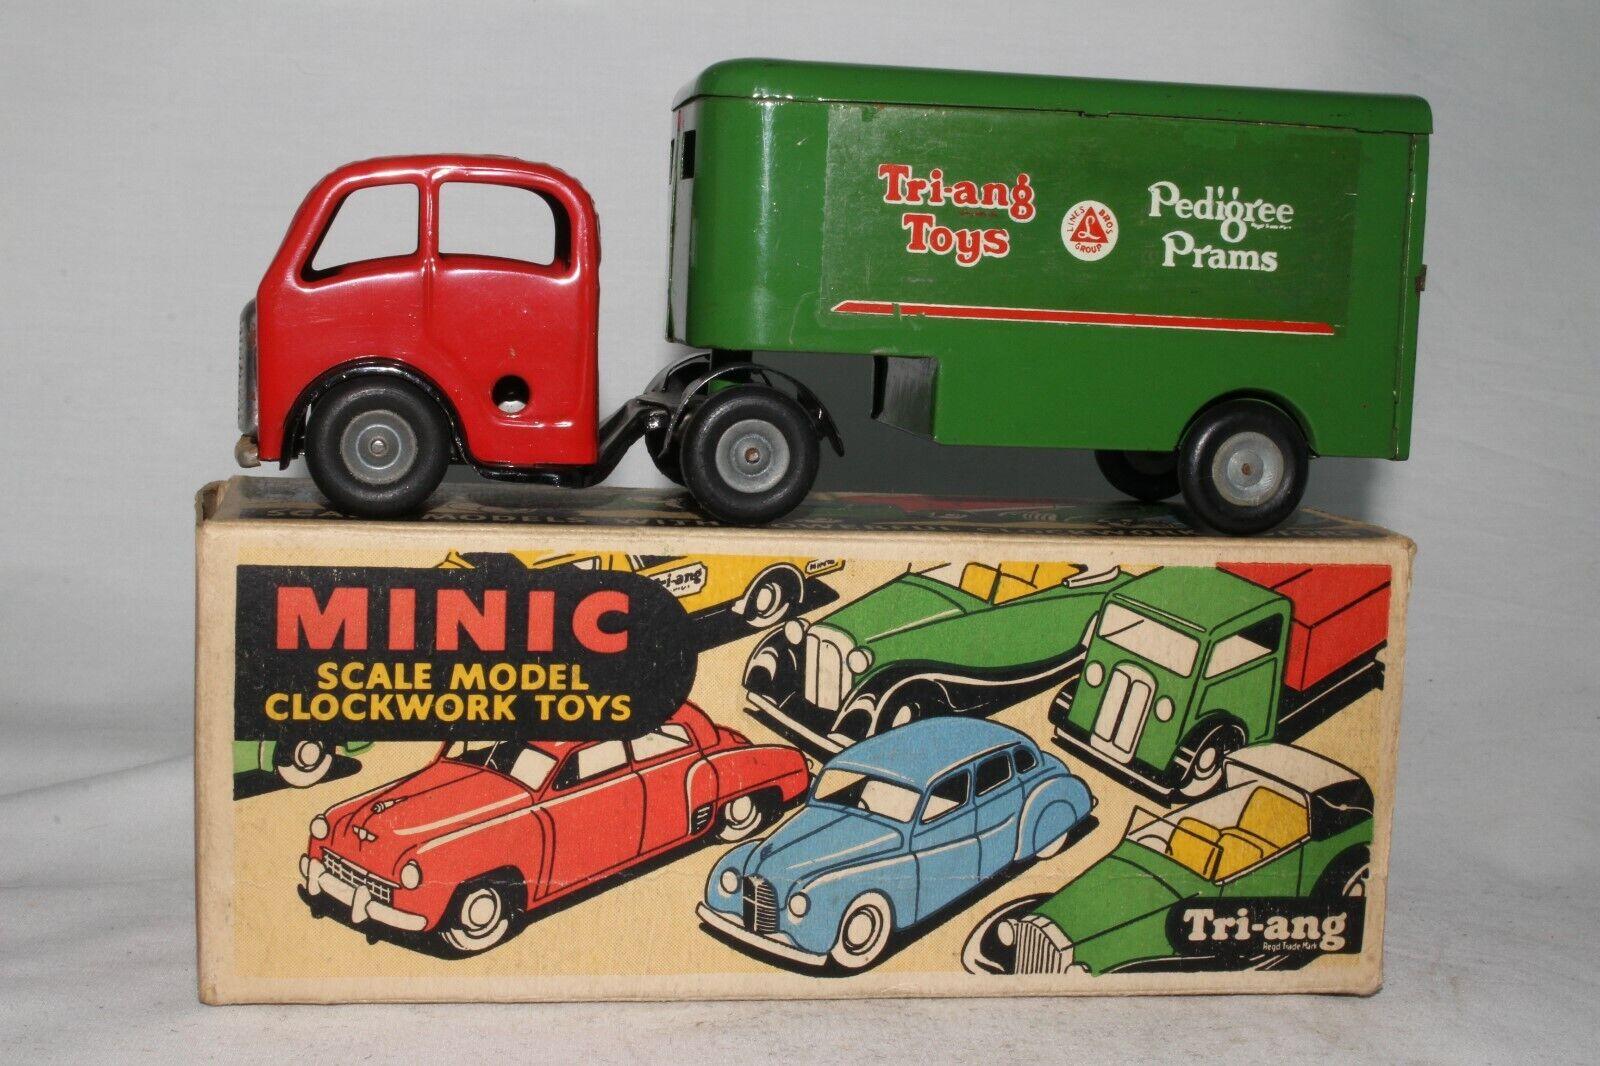 Década de 1950 Triang Minic Lata Cuerda Semi Camión, Pedigree Sillas de paseo con Caja Original